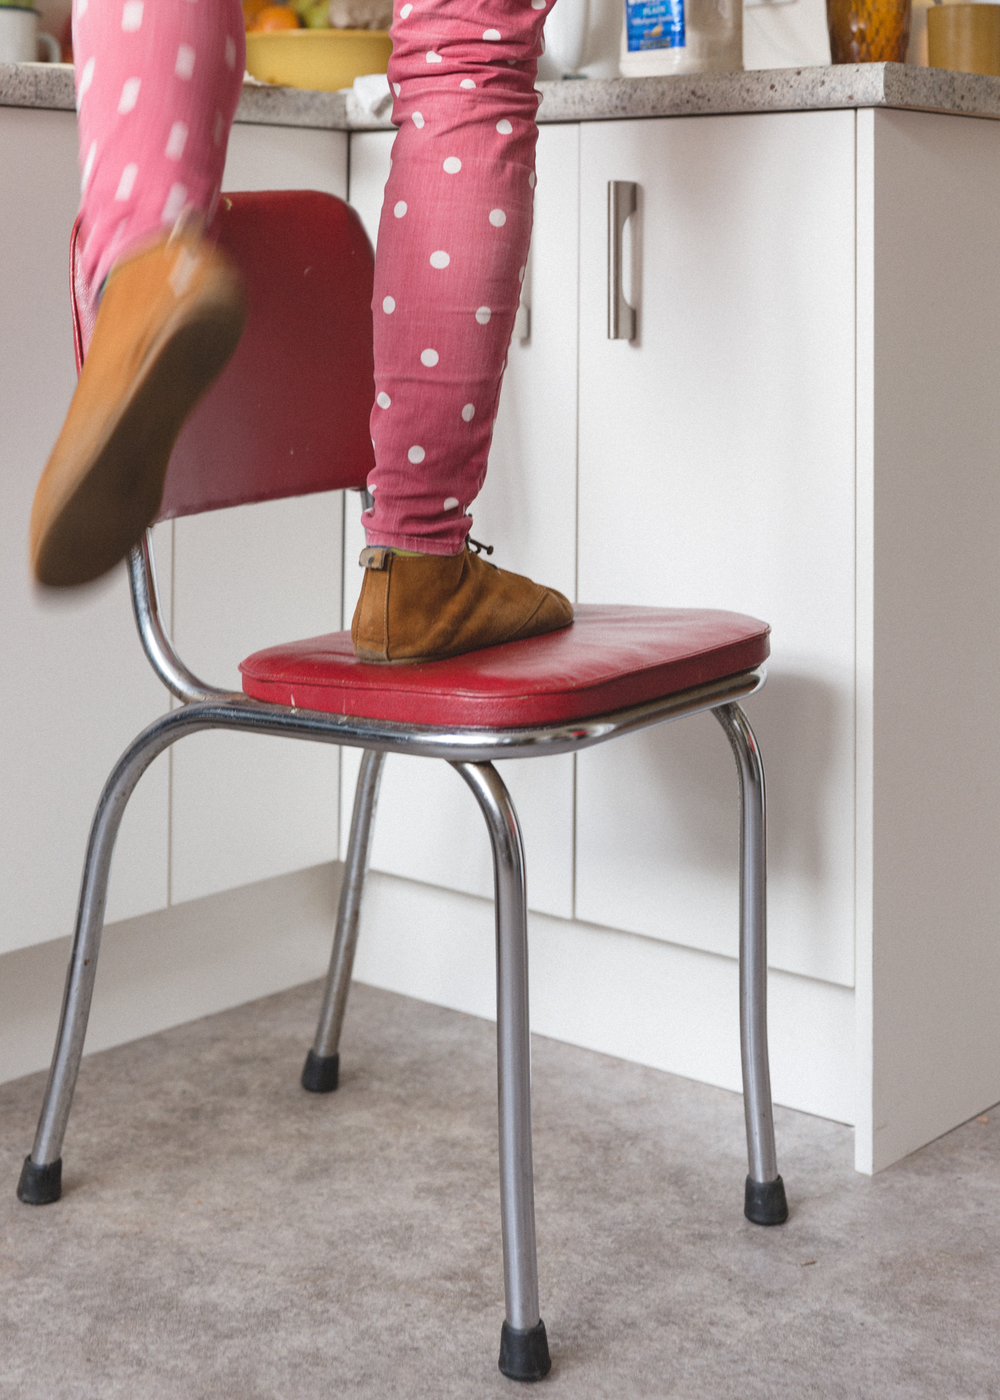 chair stool reach cupboard home interior documentary